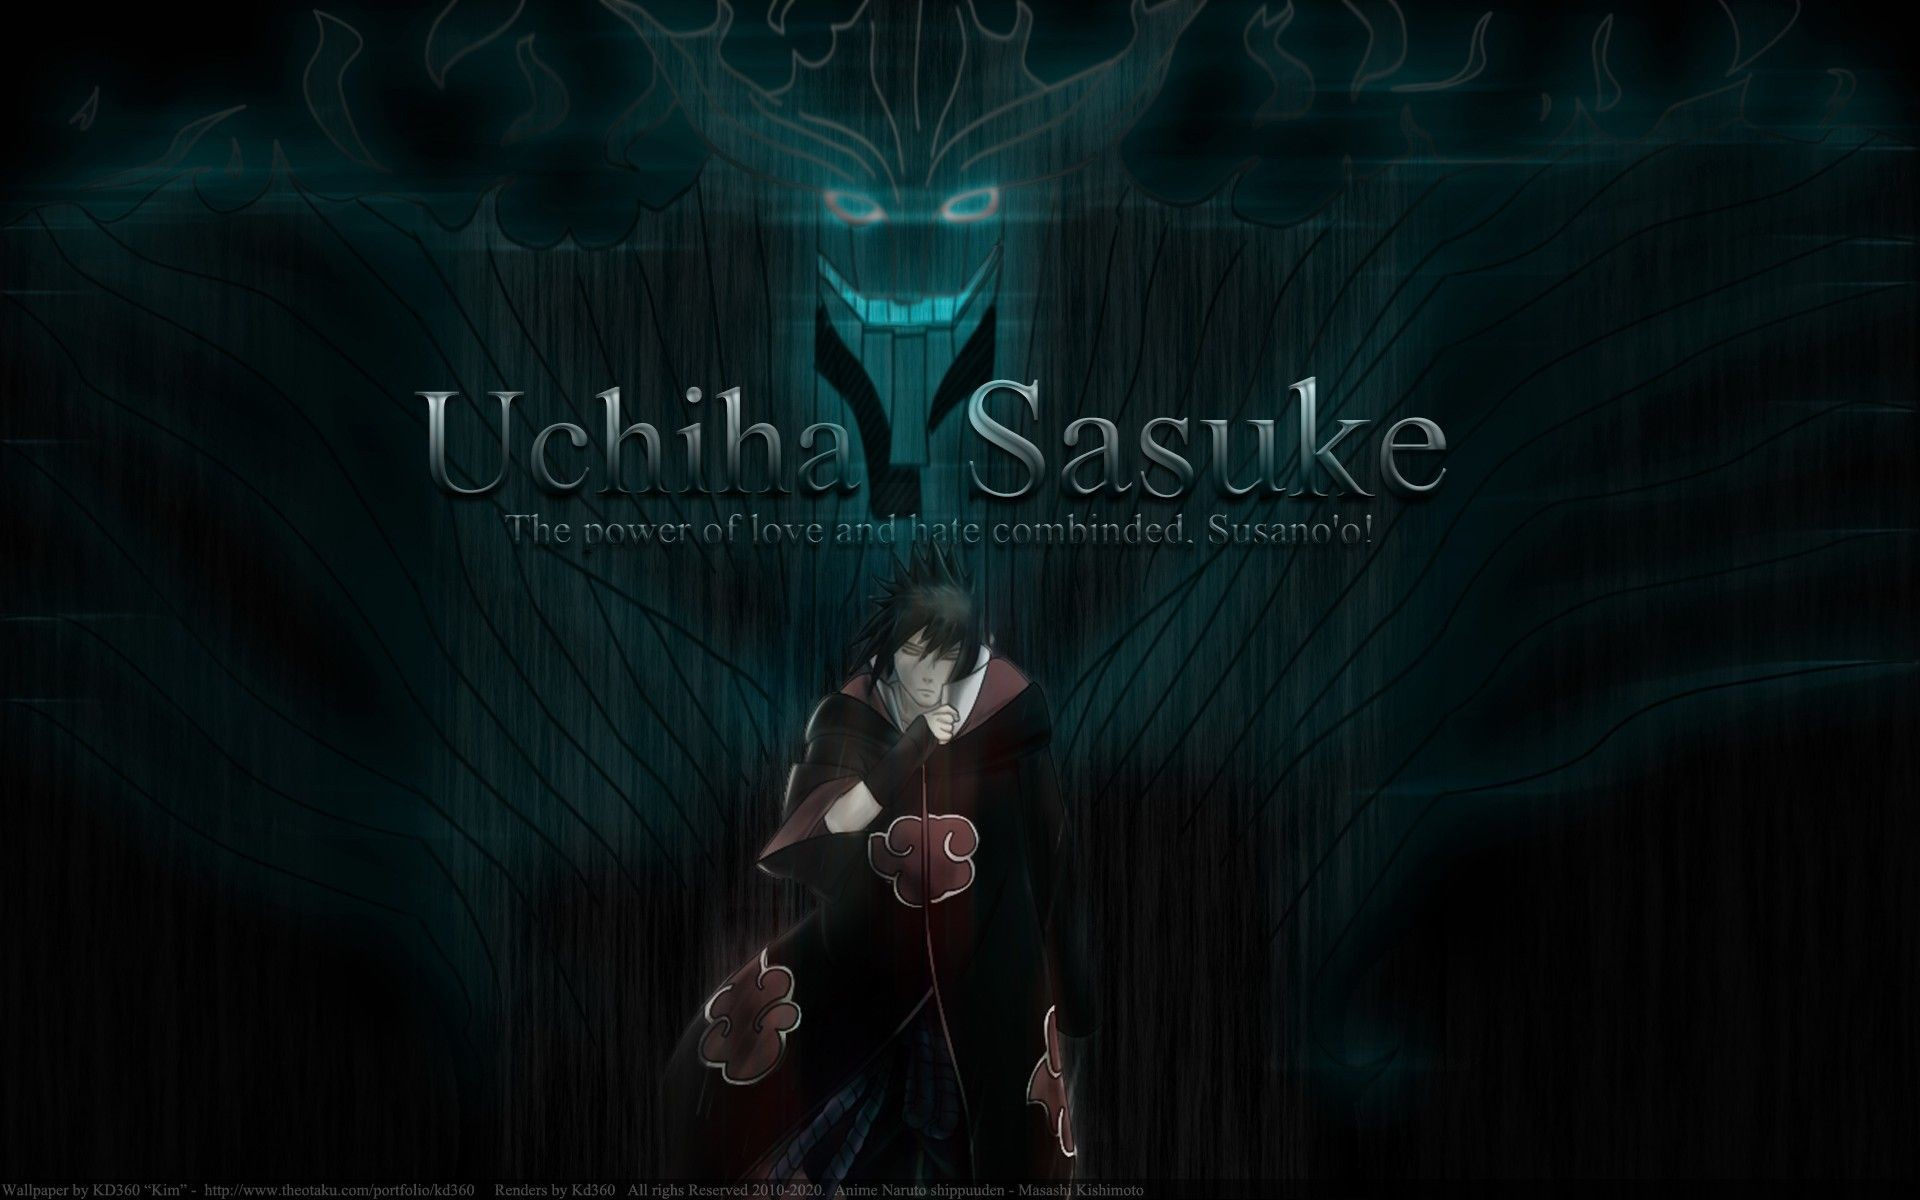 Naruto Sasuke wallpaper 1920×1200 Imagenes De Naruto Y Sasuke Wallpapers  (61 Wallpapers)